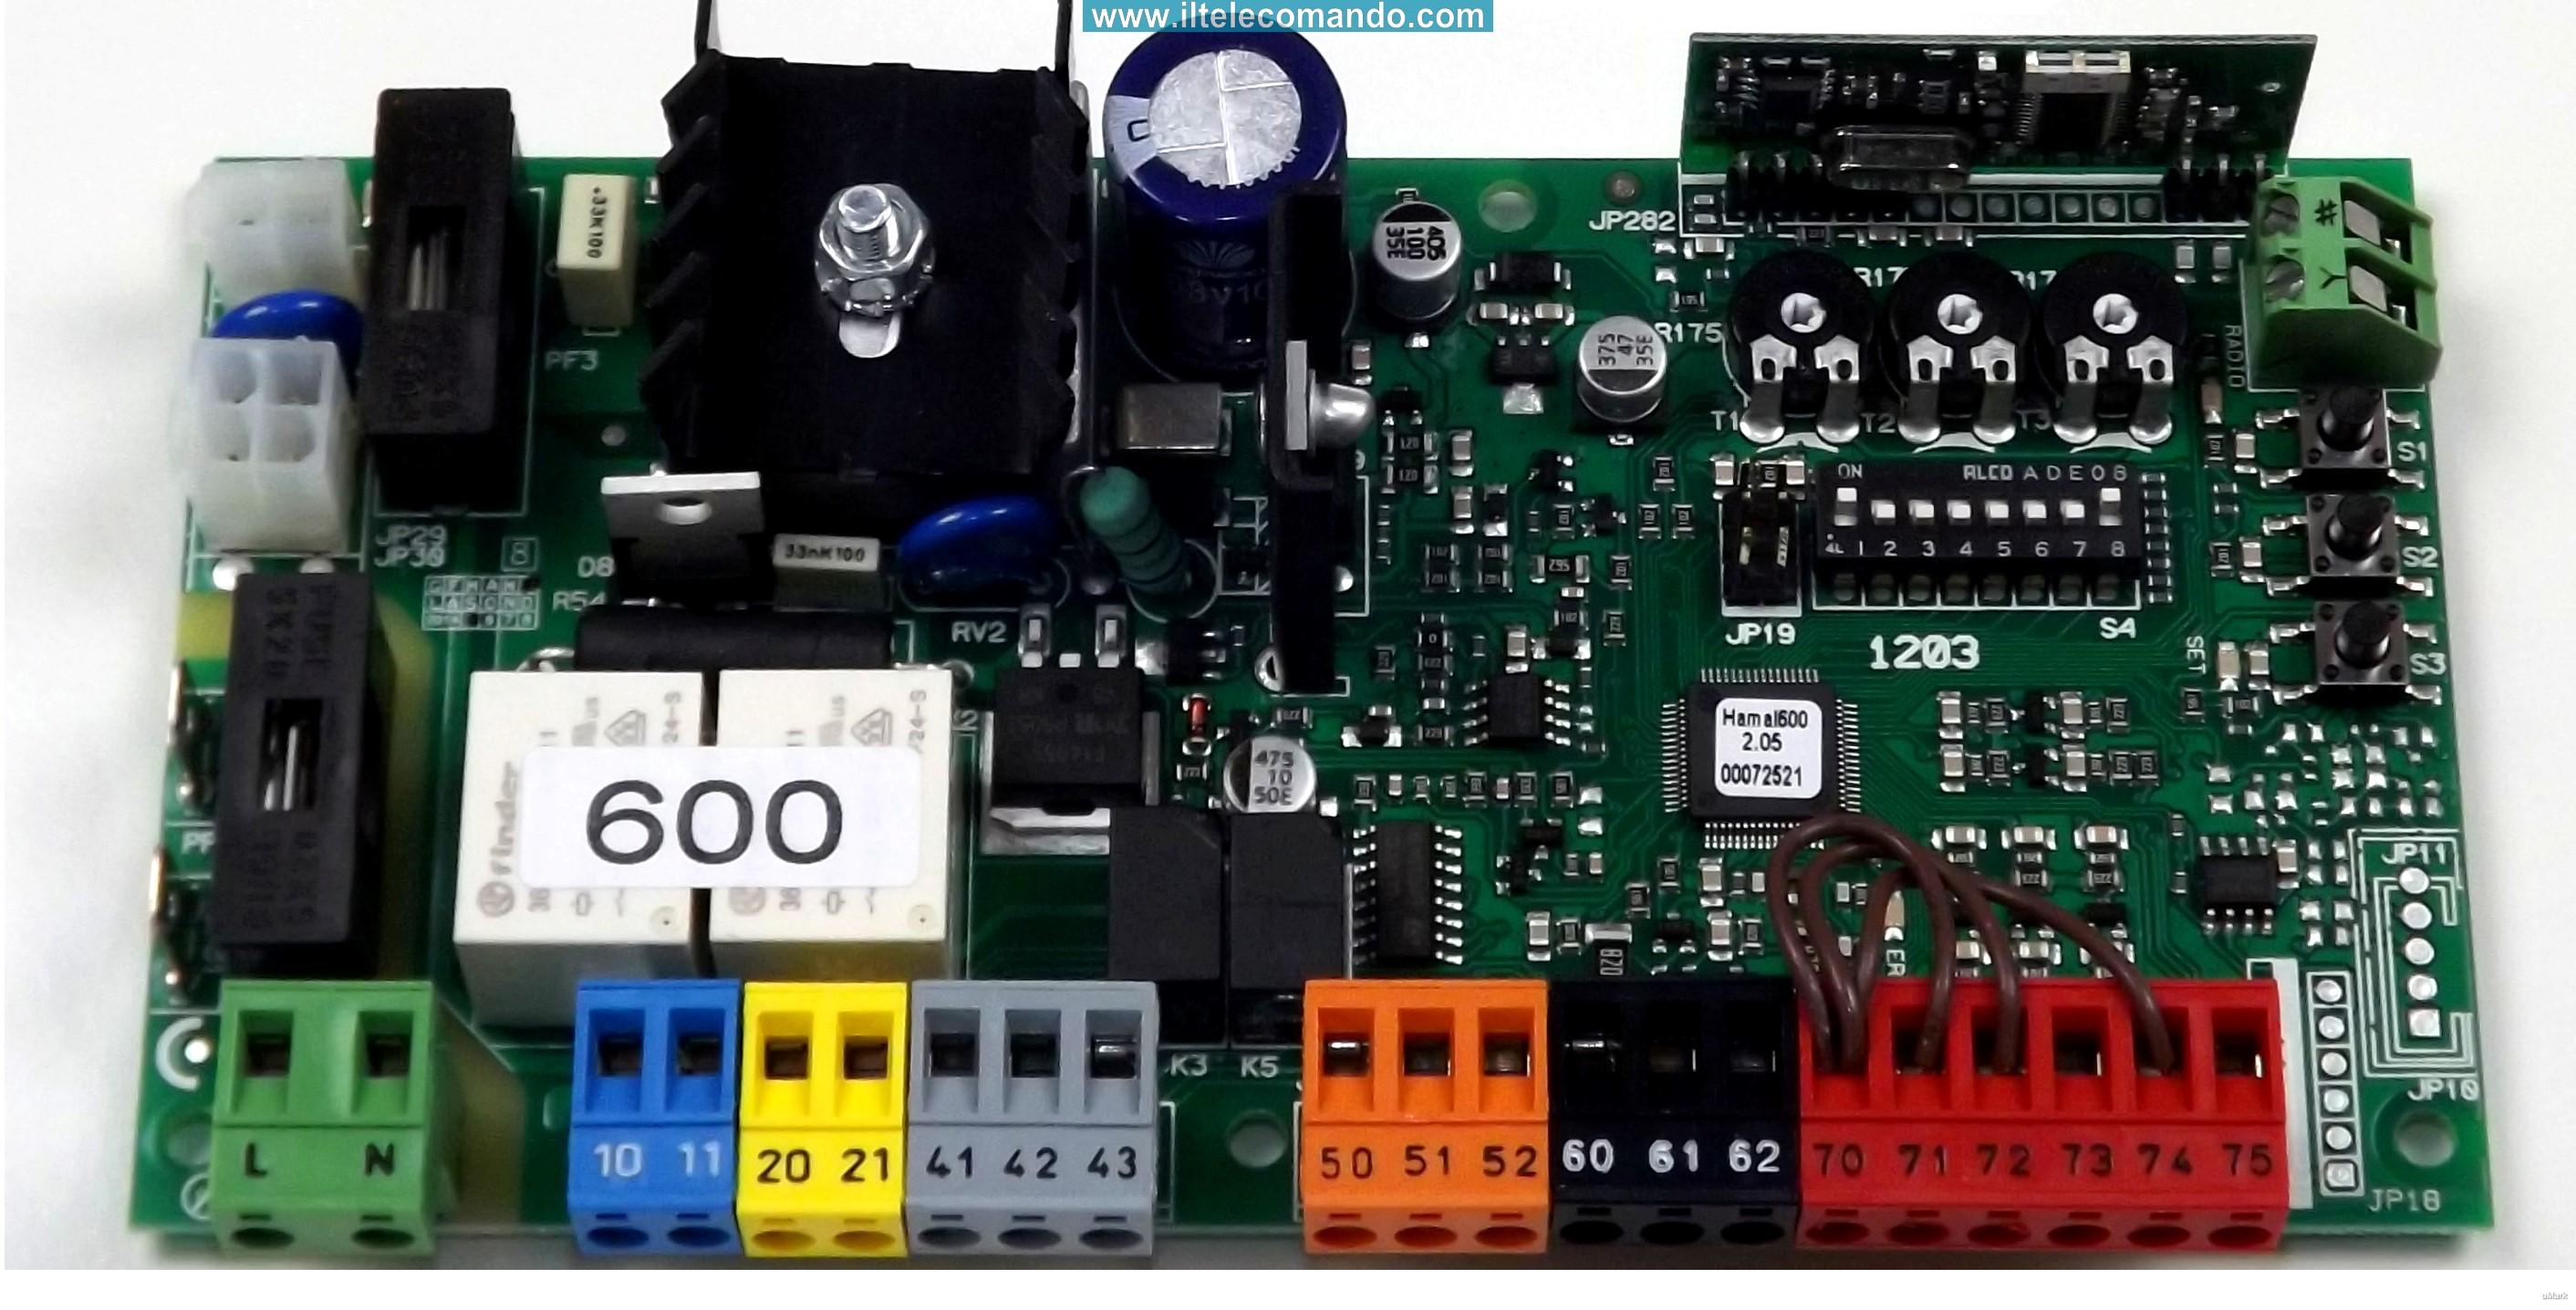 Circuit Board Wiring Diagram Urano - Schematics Wiring Diagrams •